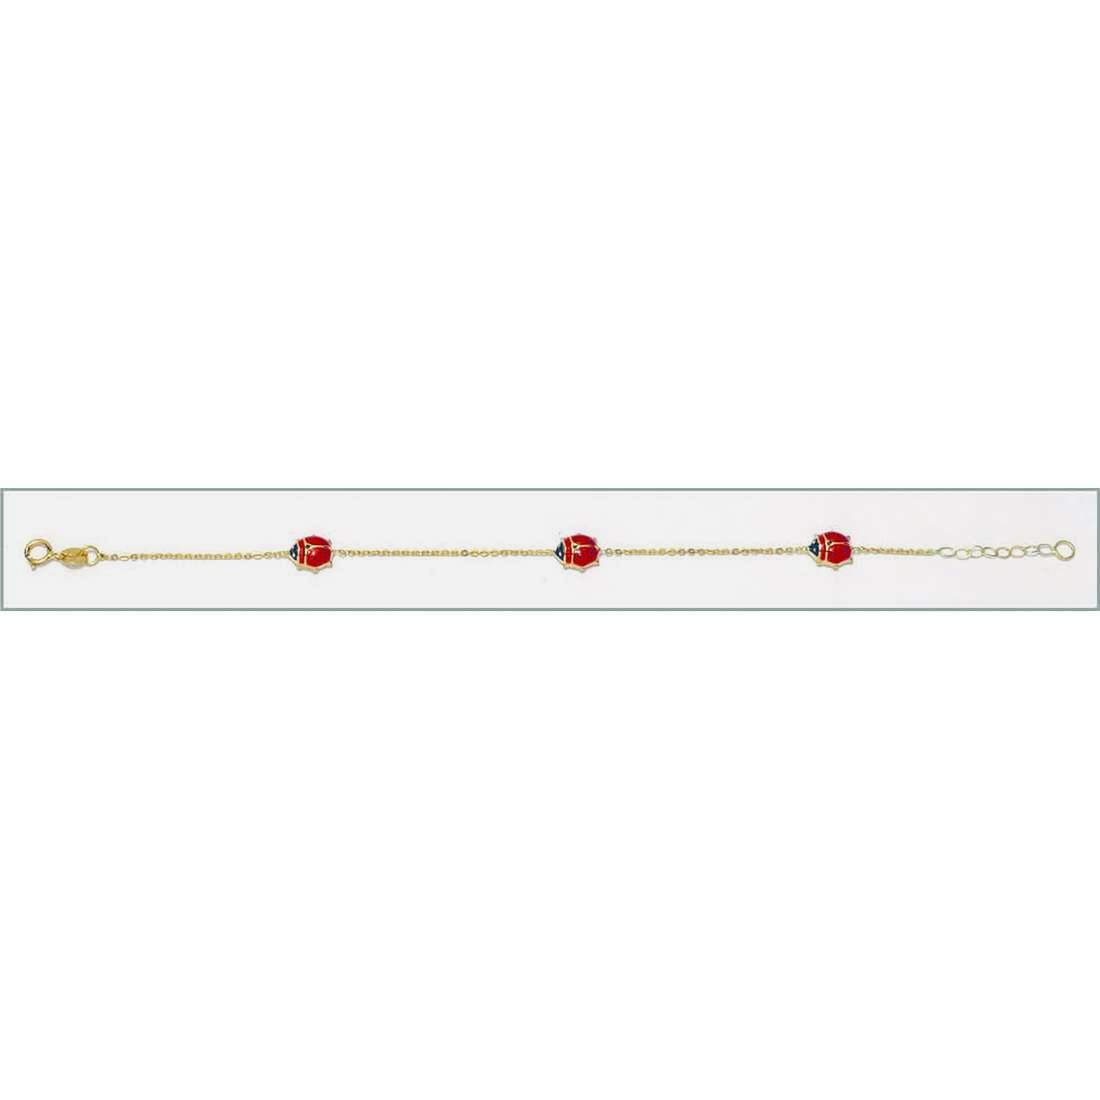 bracelet unisex jewellery Facco Gioielli 711896